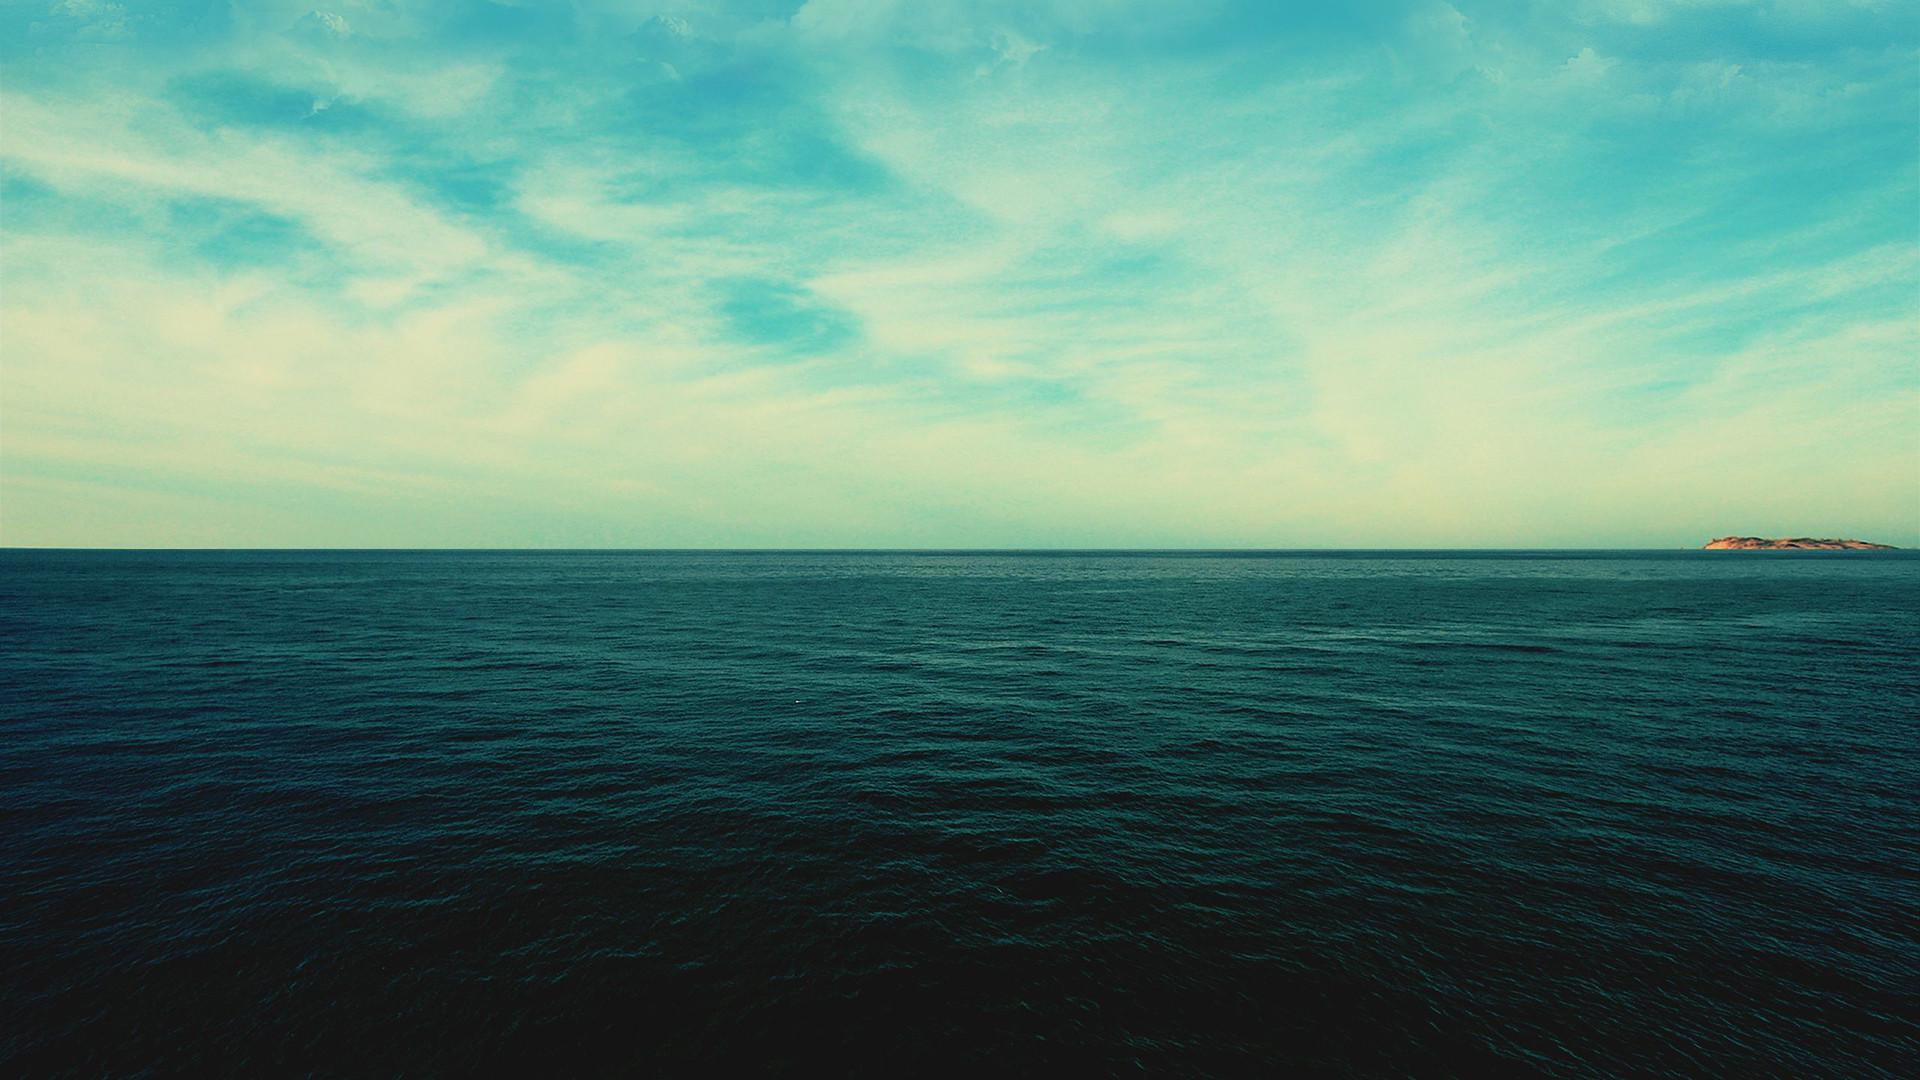 open sea wallpaper background, wallpapers